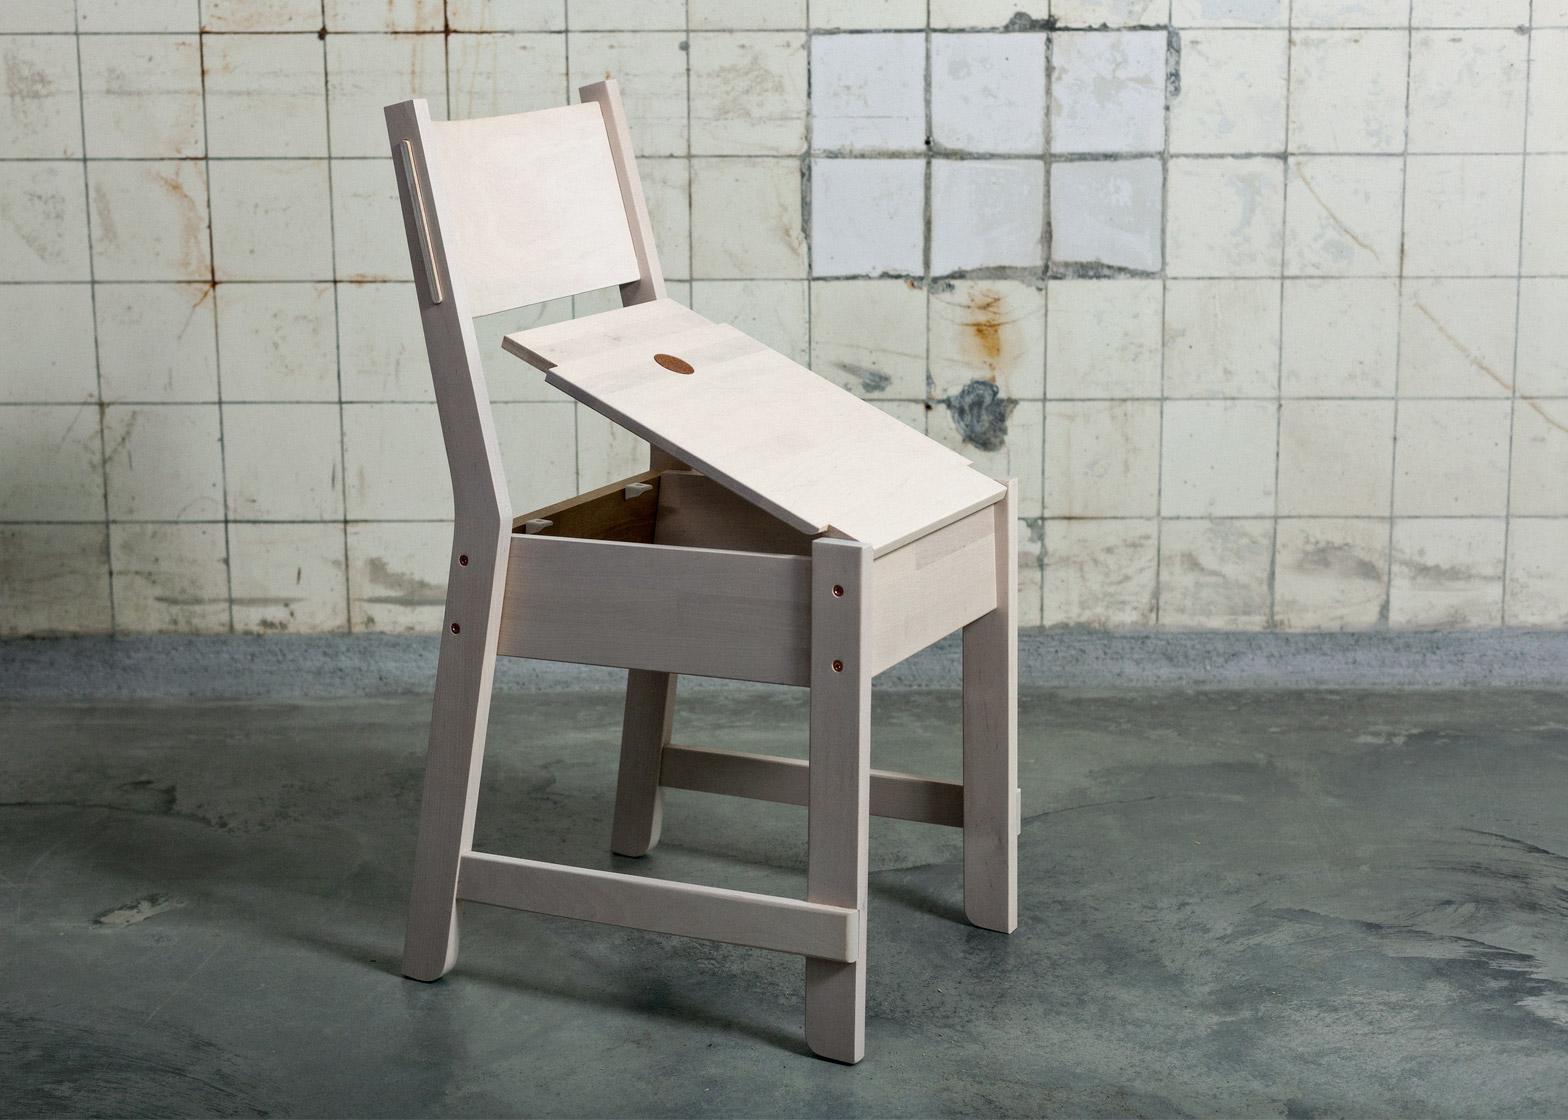 Ikea-Space-10-Innovation-Lab_products_Alastair-Philip-Wiper_dezeen_1568_0